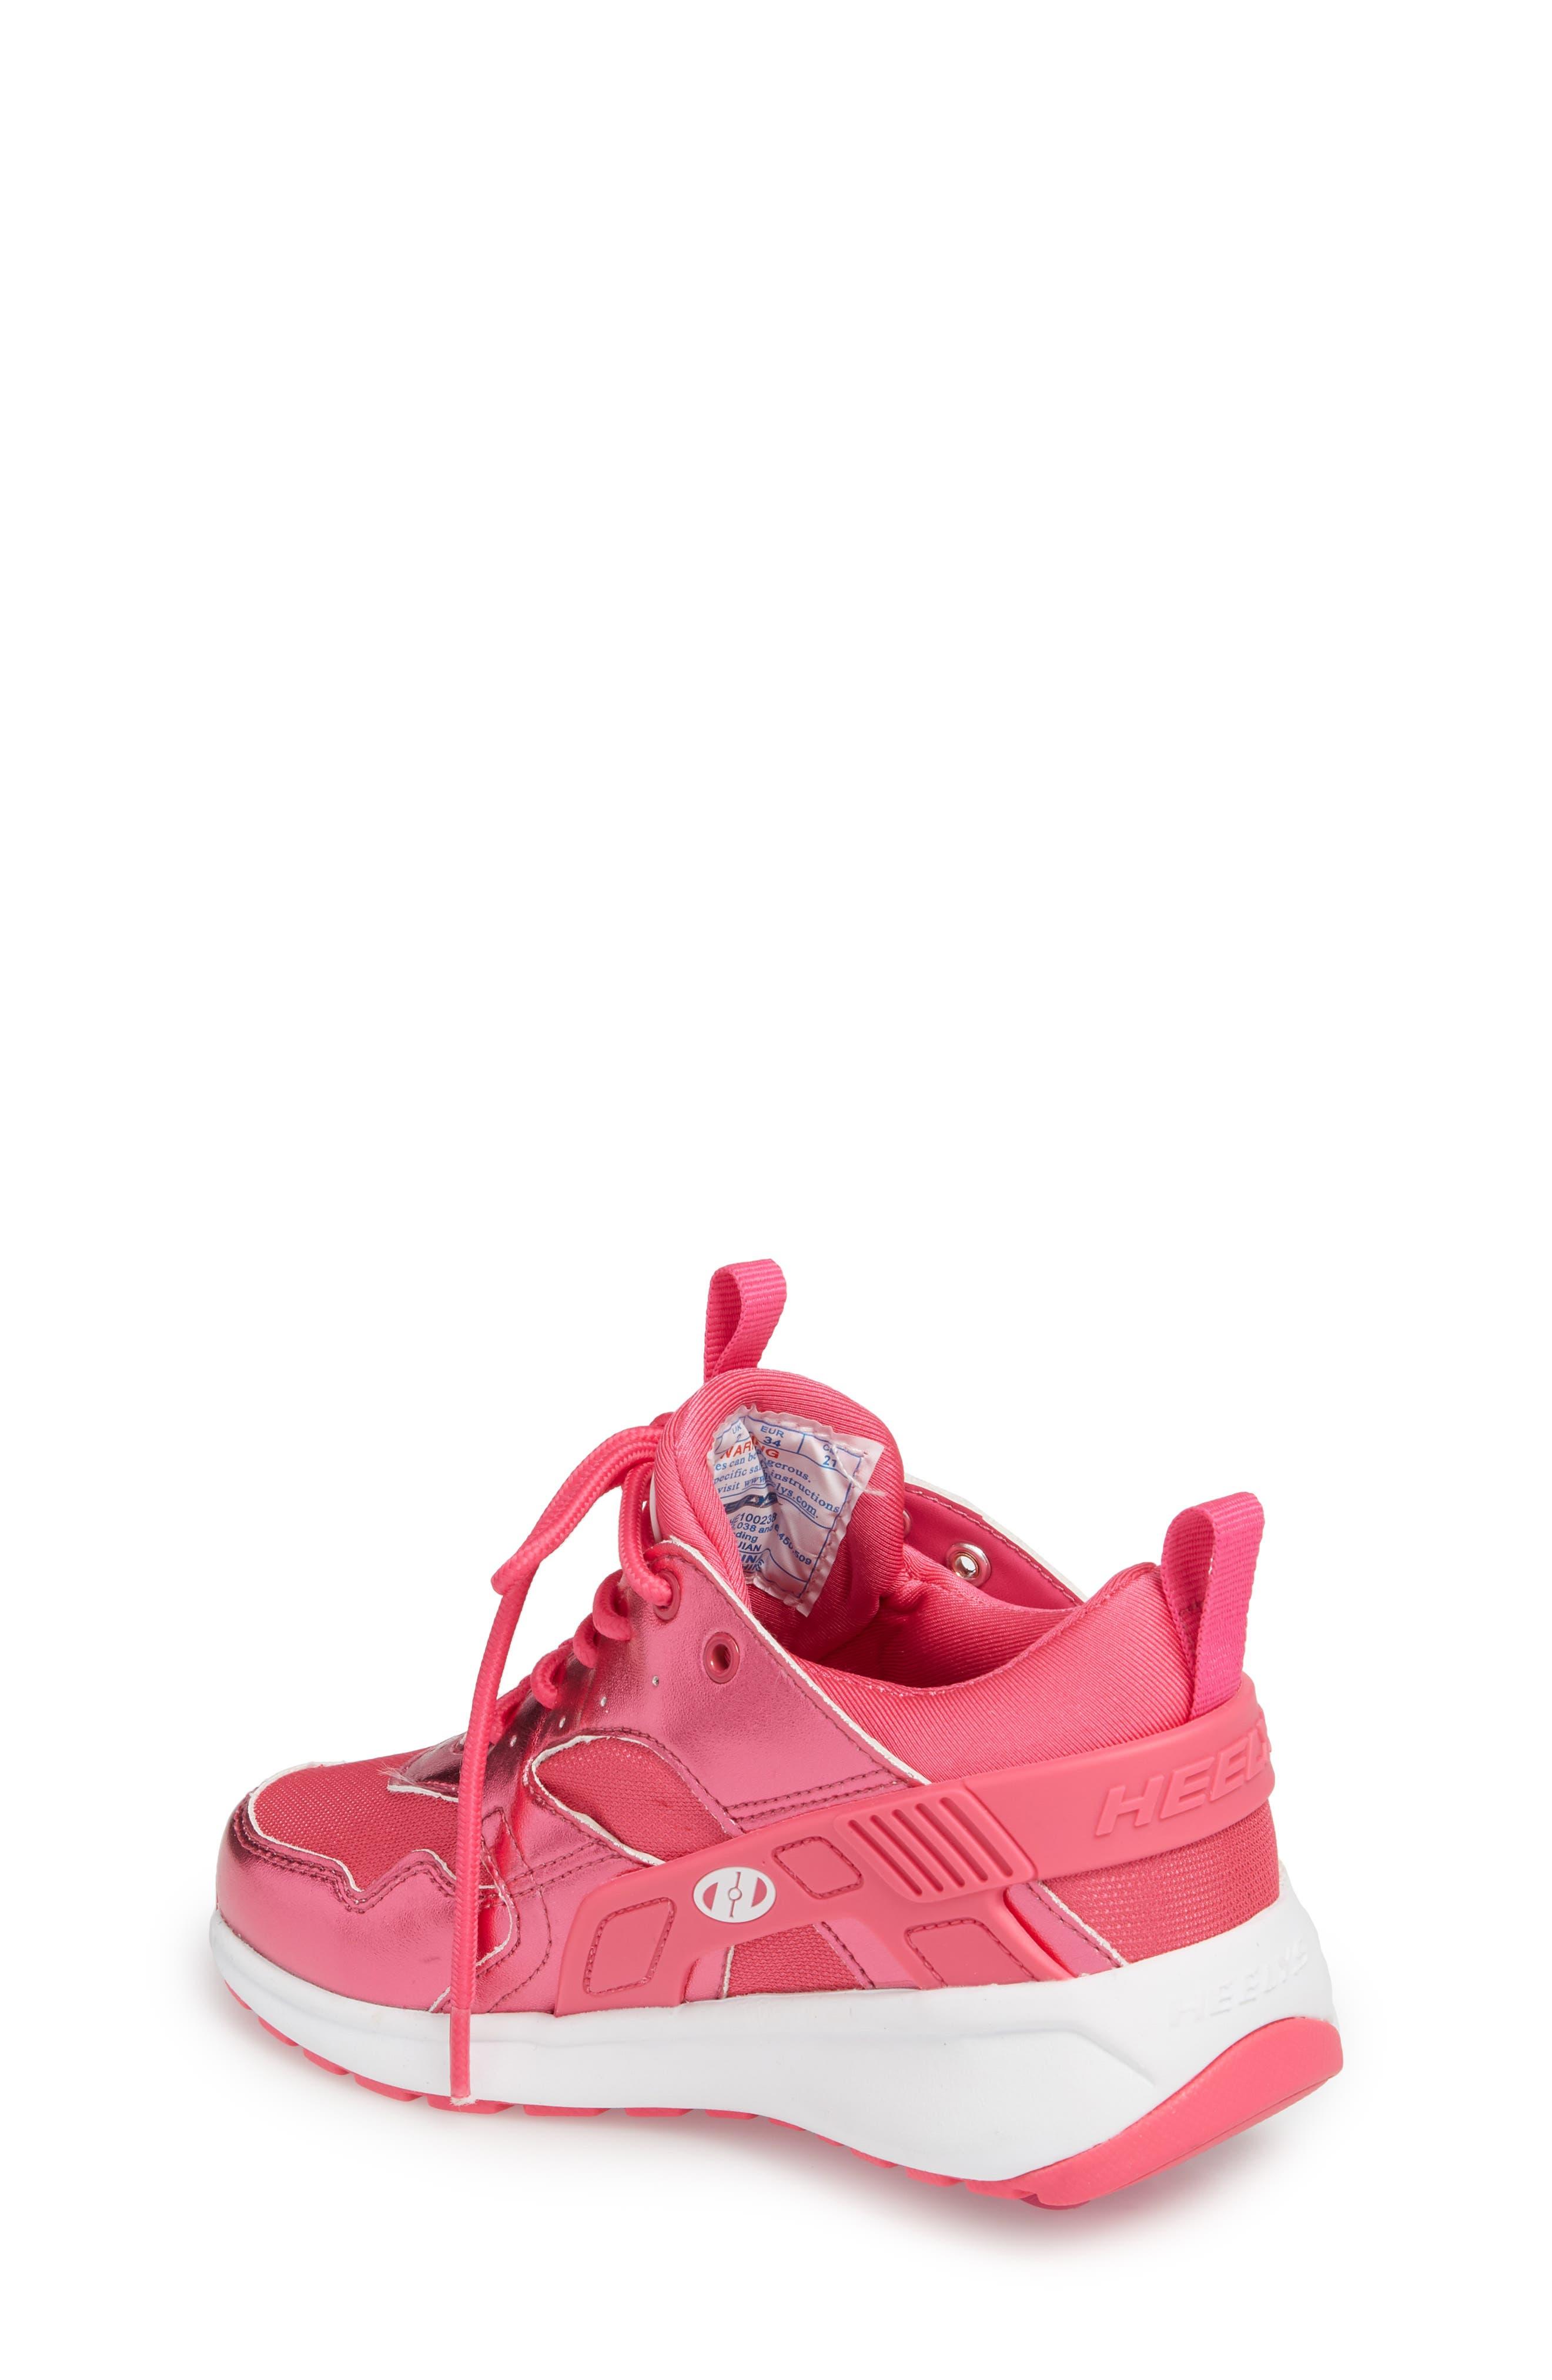 Force Sneaker,                             Alternate thumbnail 2, color,                             Pink